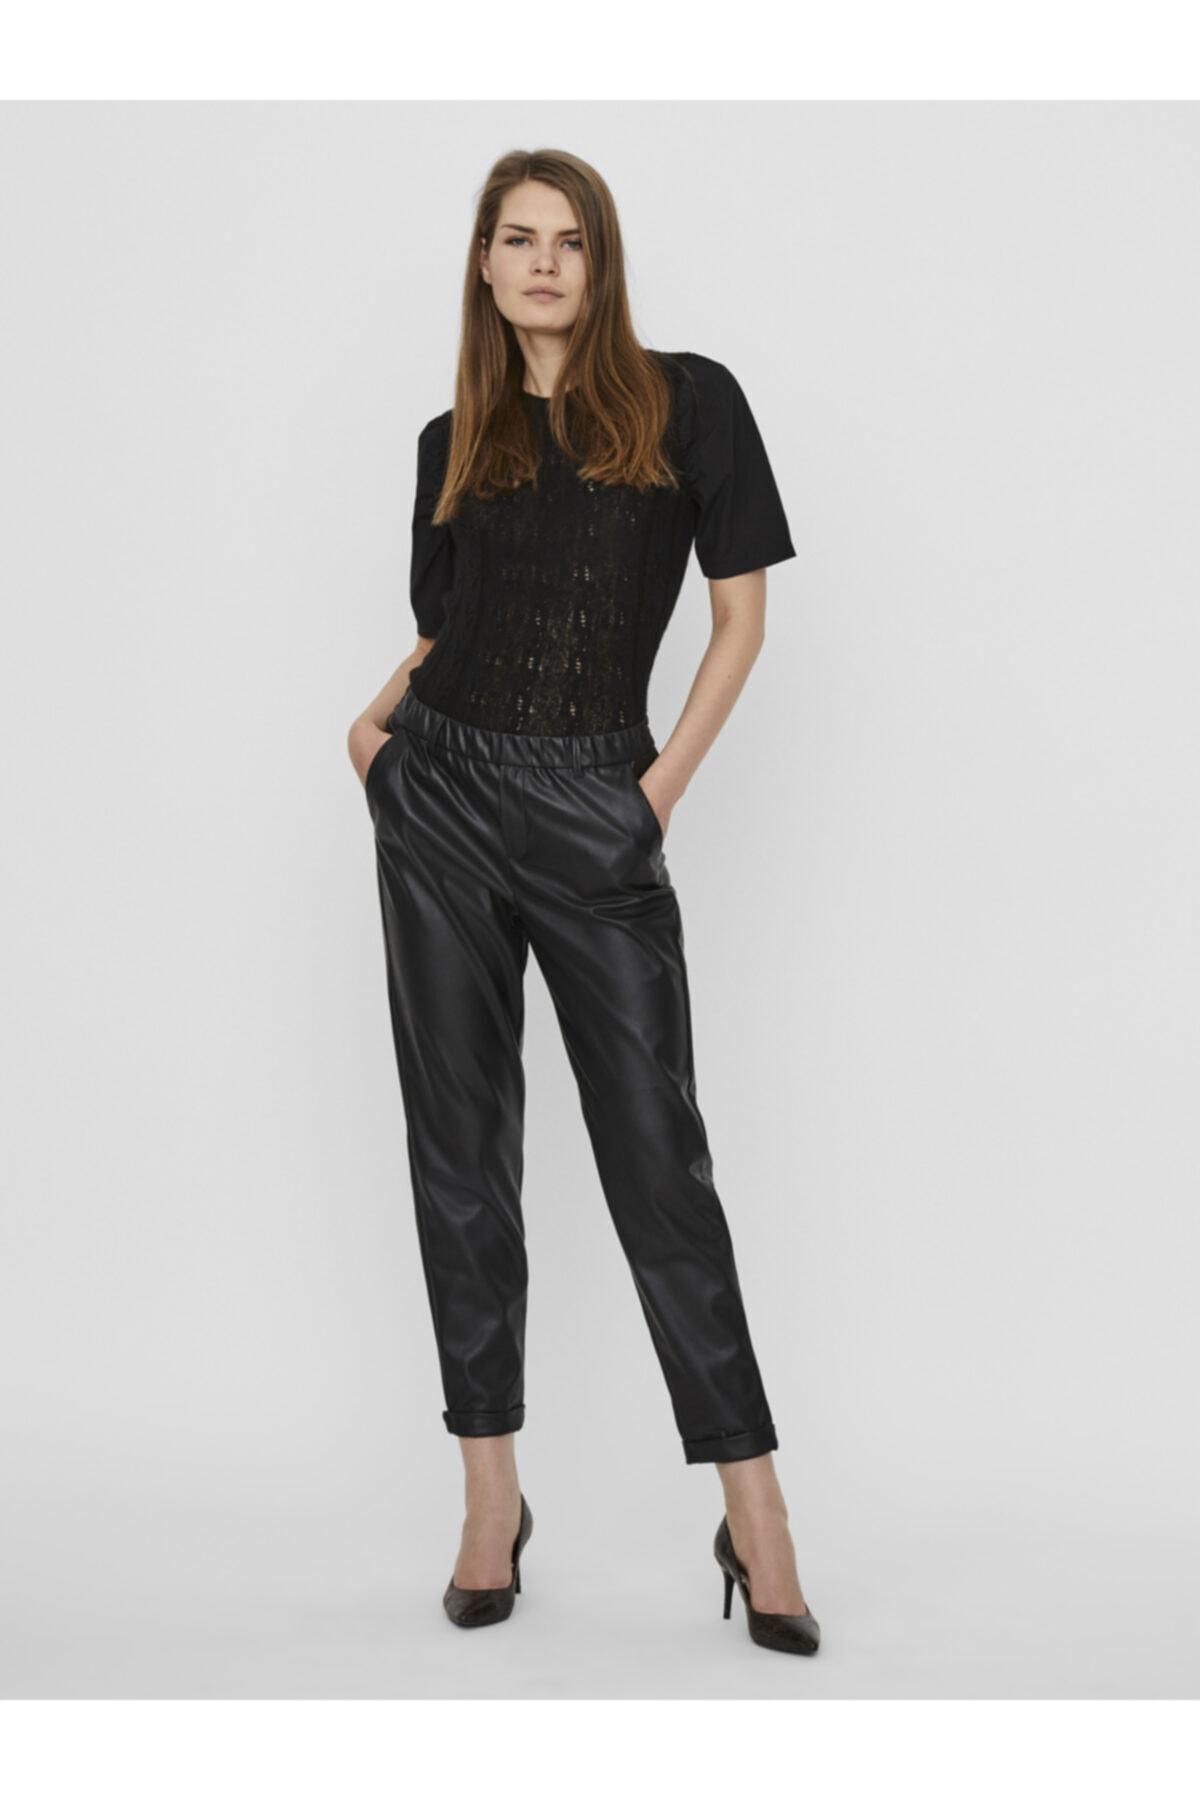 Vero Moda Kadın Siyah Beli Lastikli Deri Pantolon 10237236 VMMAYA 1